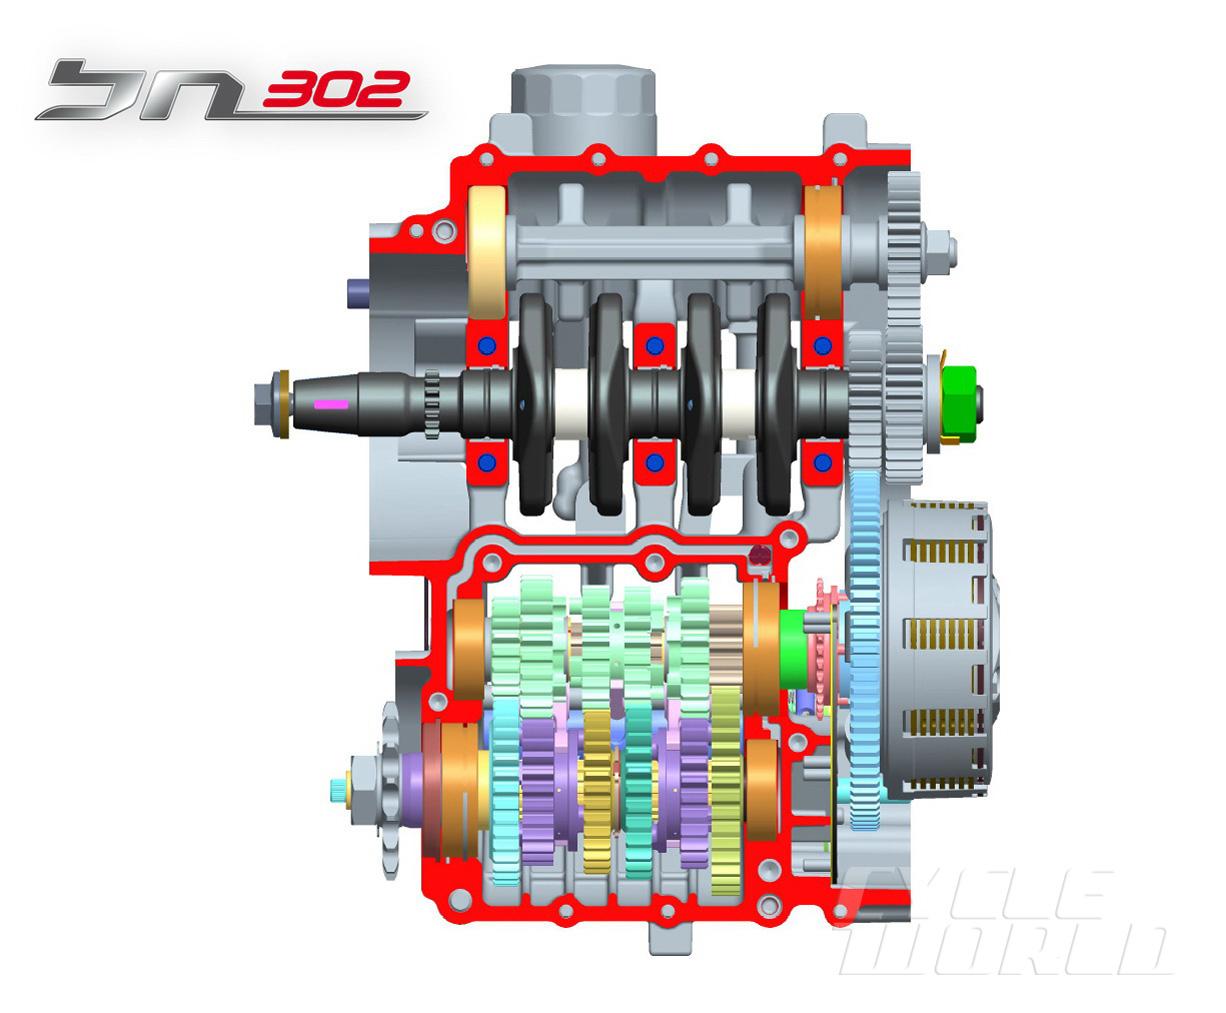 Bn302 Tnt300 Quality Concerns